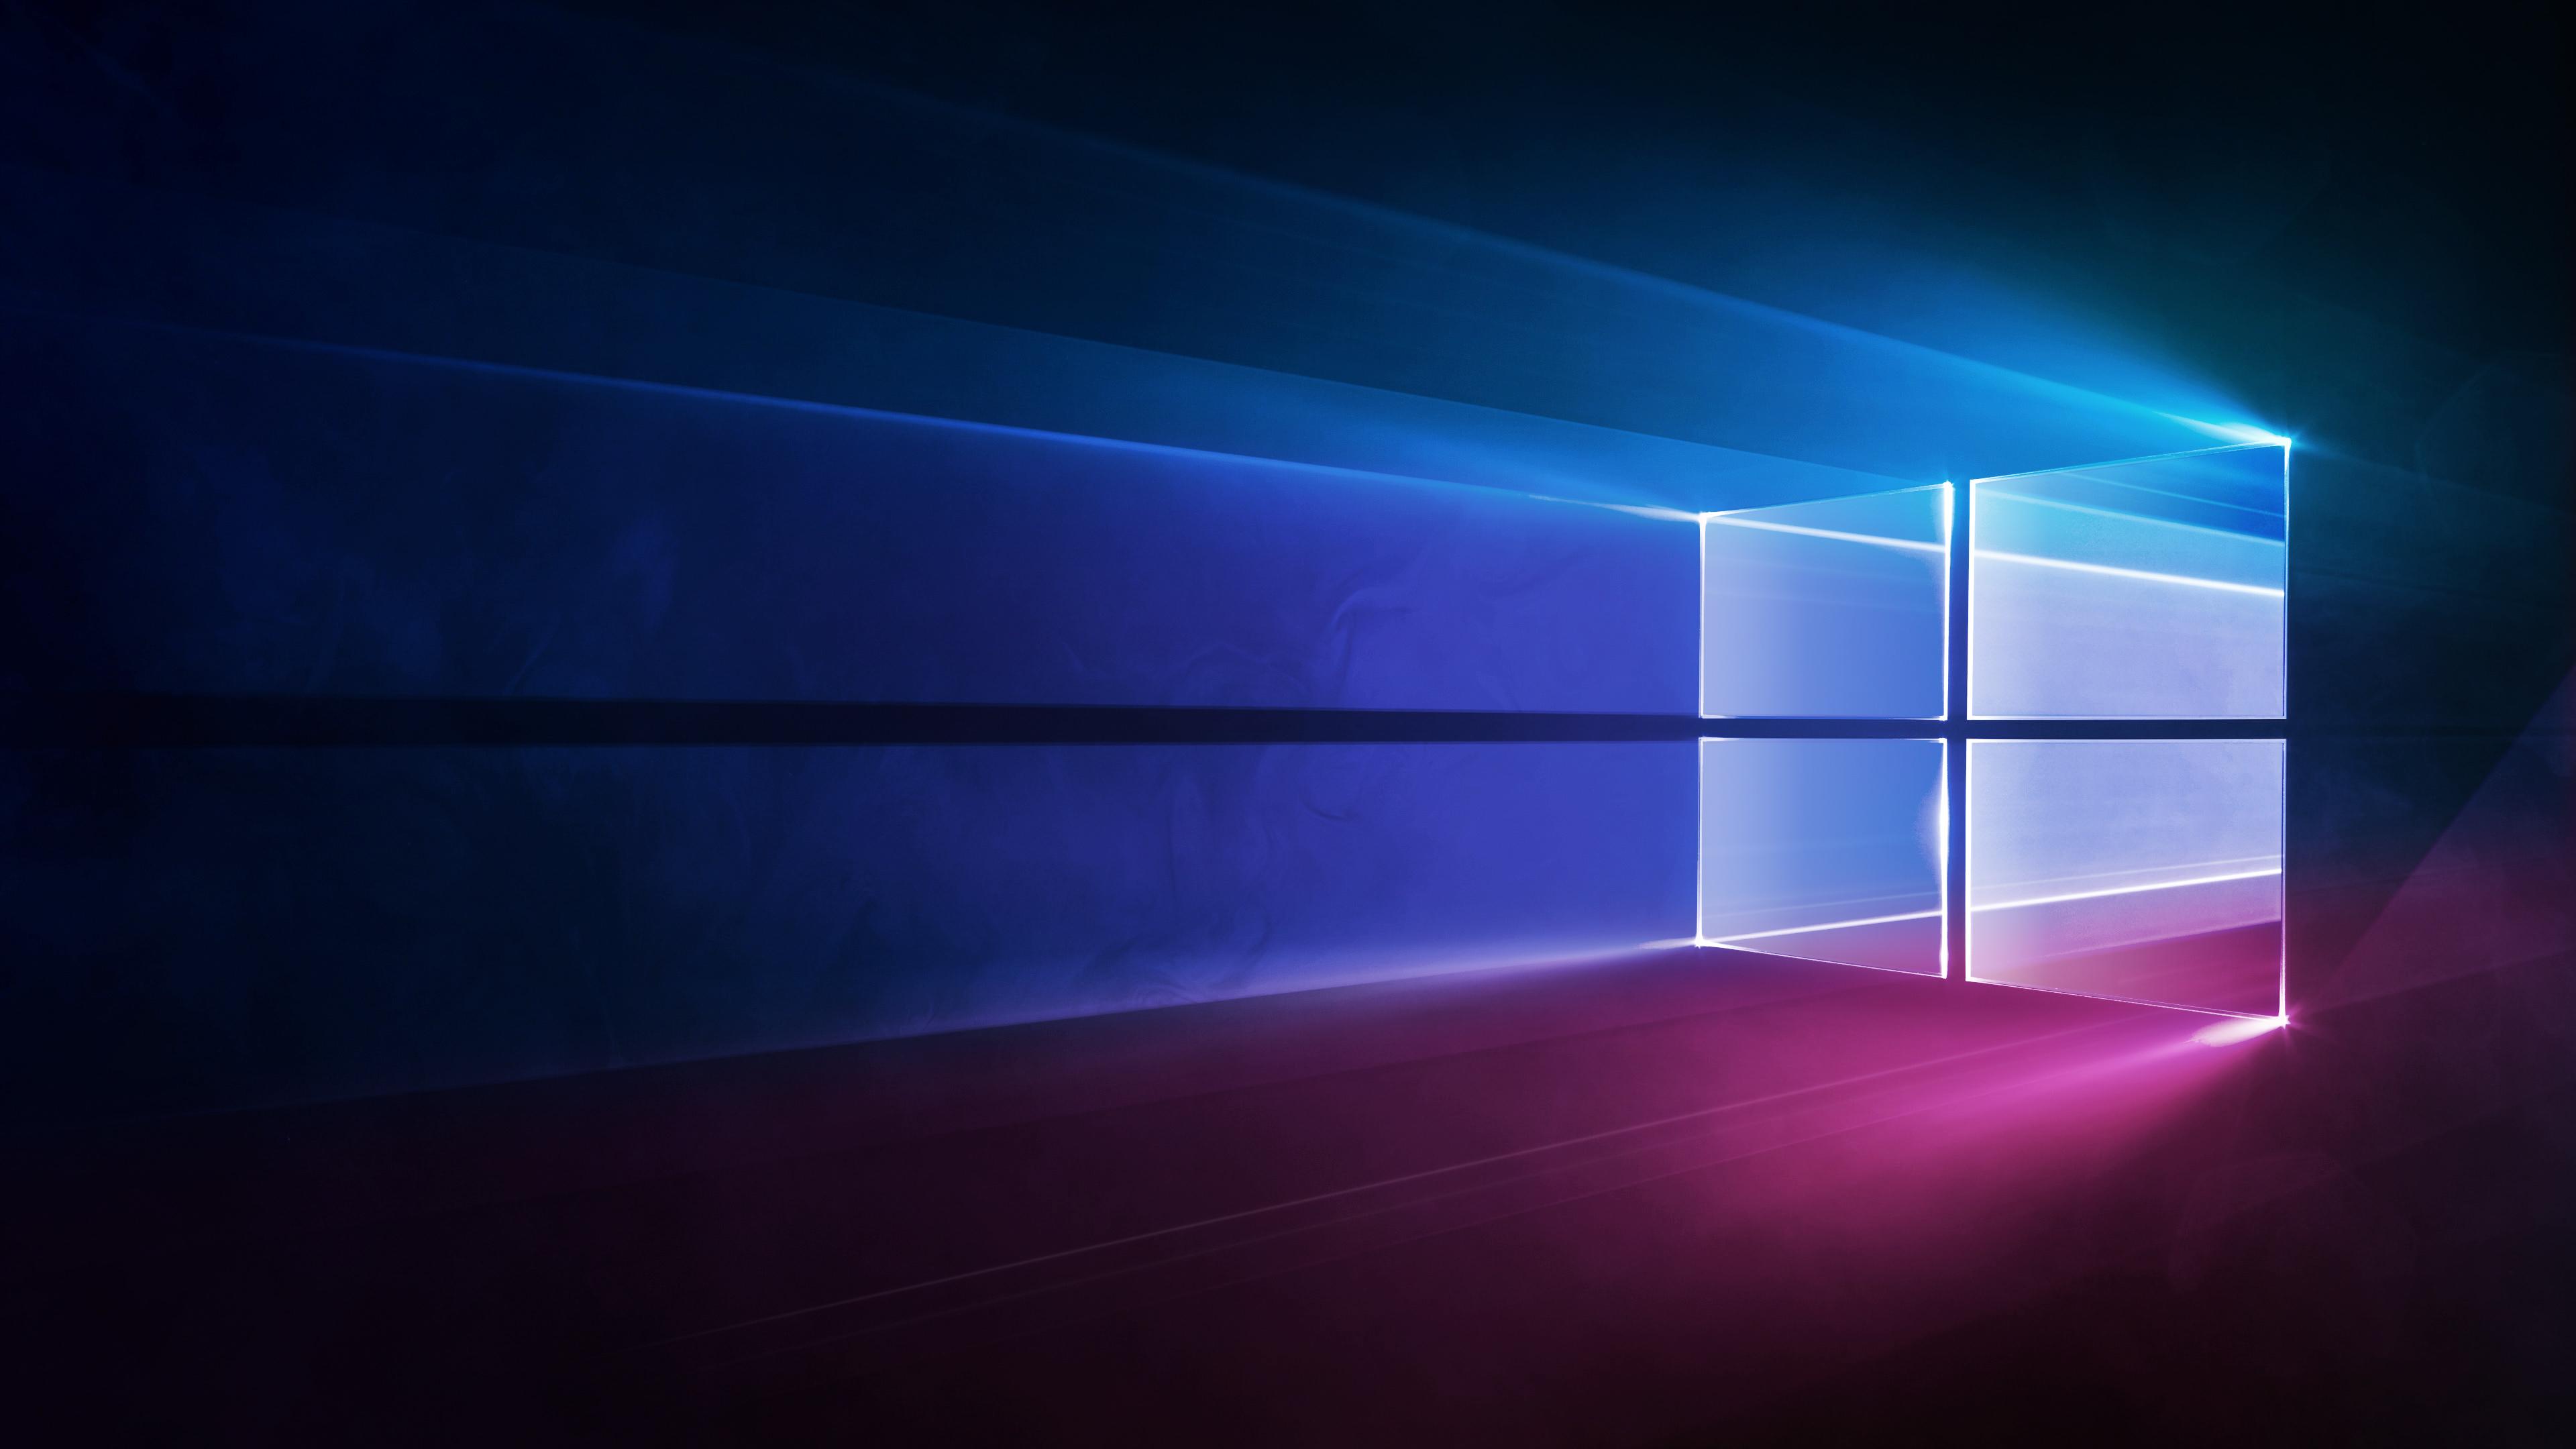 Masaüstü Windows10 Microsoft 3840x2160 Heroyoung 1147005